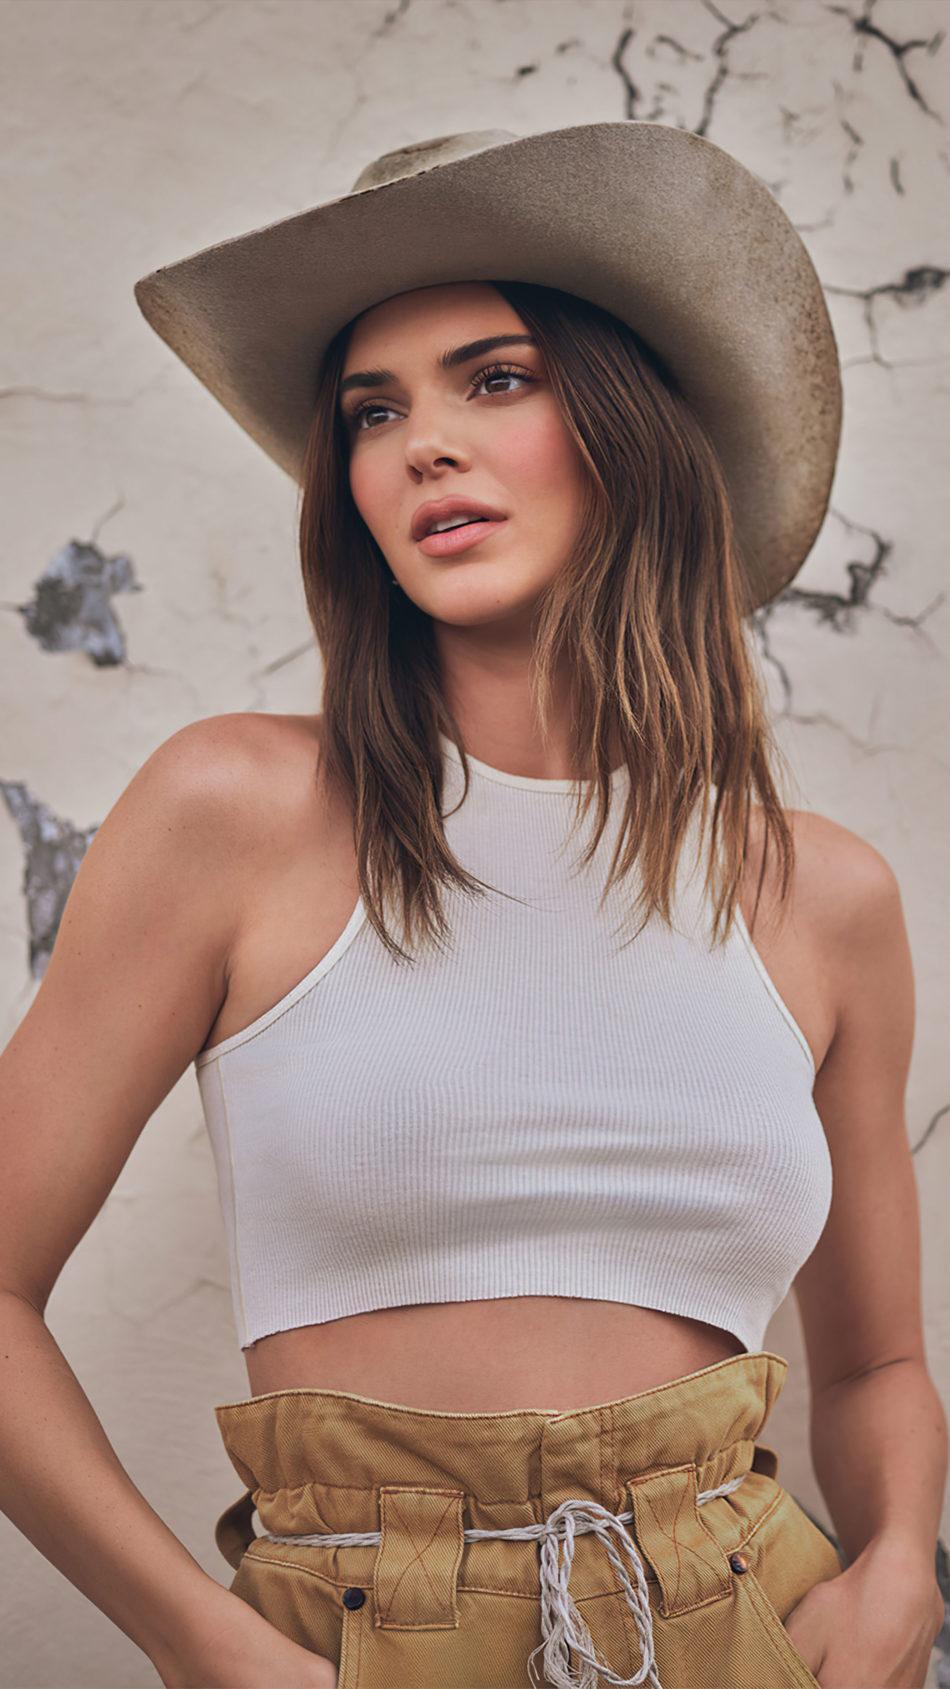 Kendall Jenner Wearing Cowboy Style Hat 2021 Photoshoot 4K Ultra HD Mobile Wallpaper